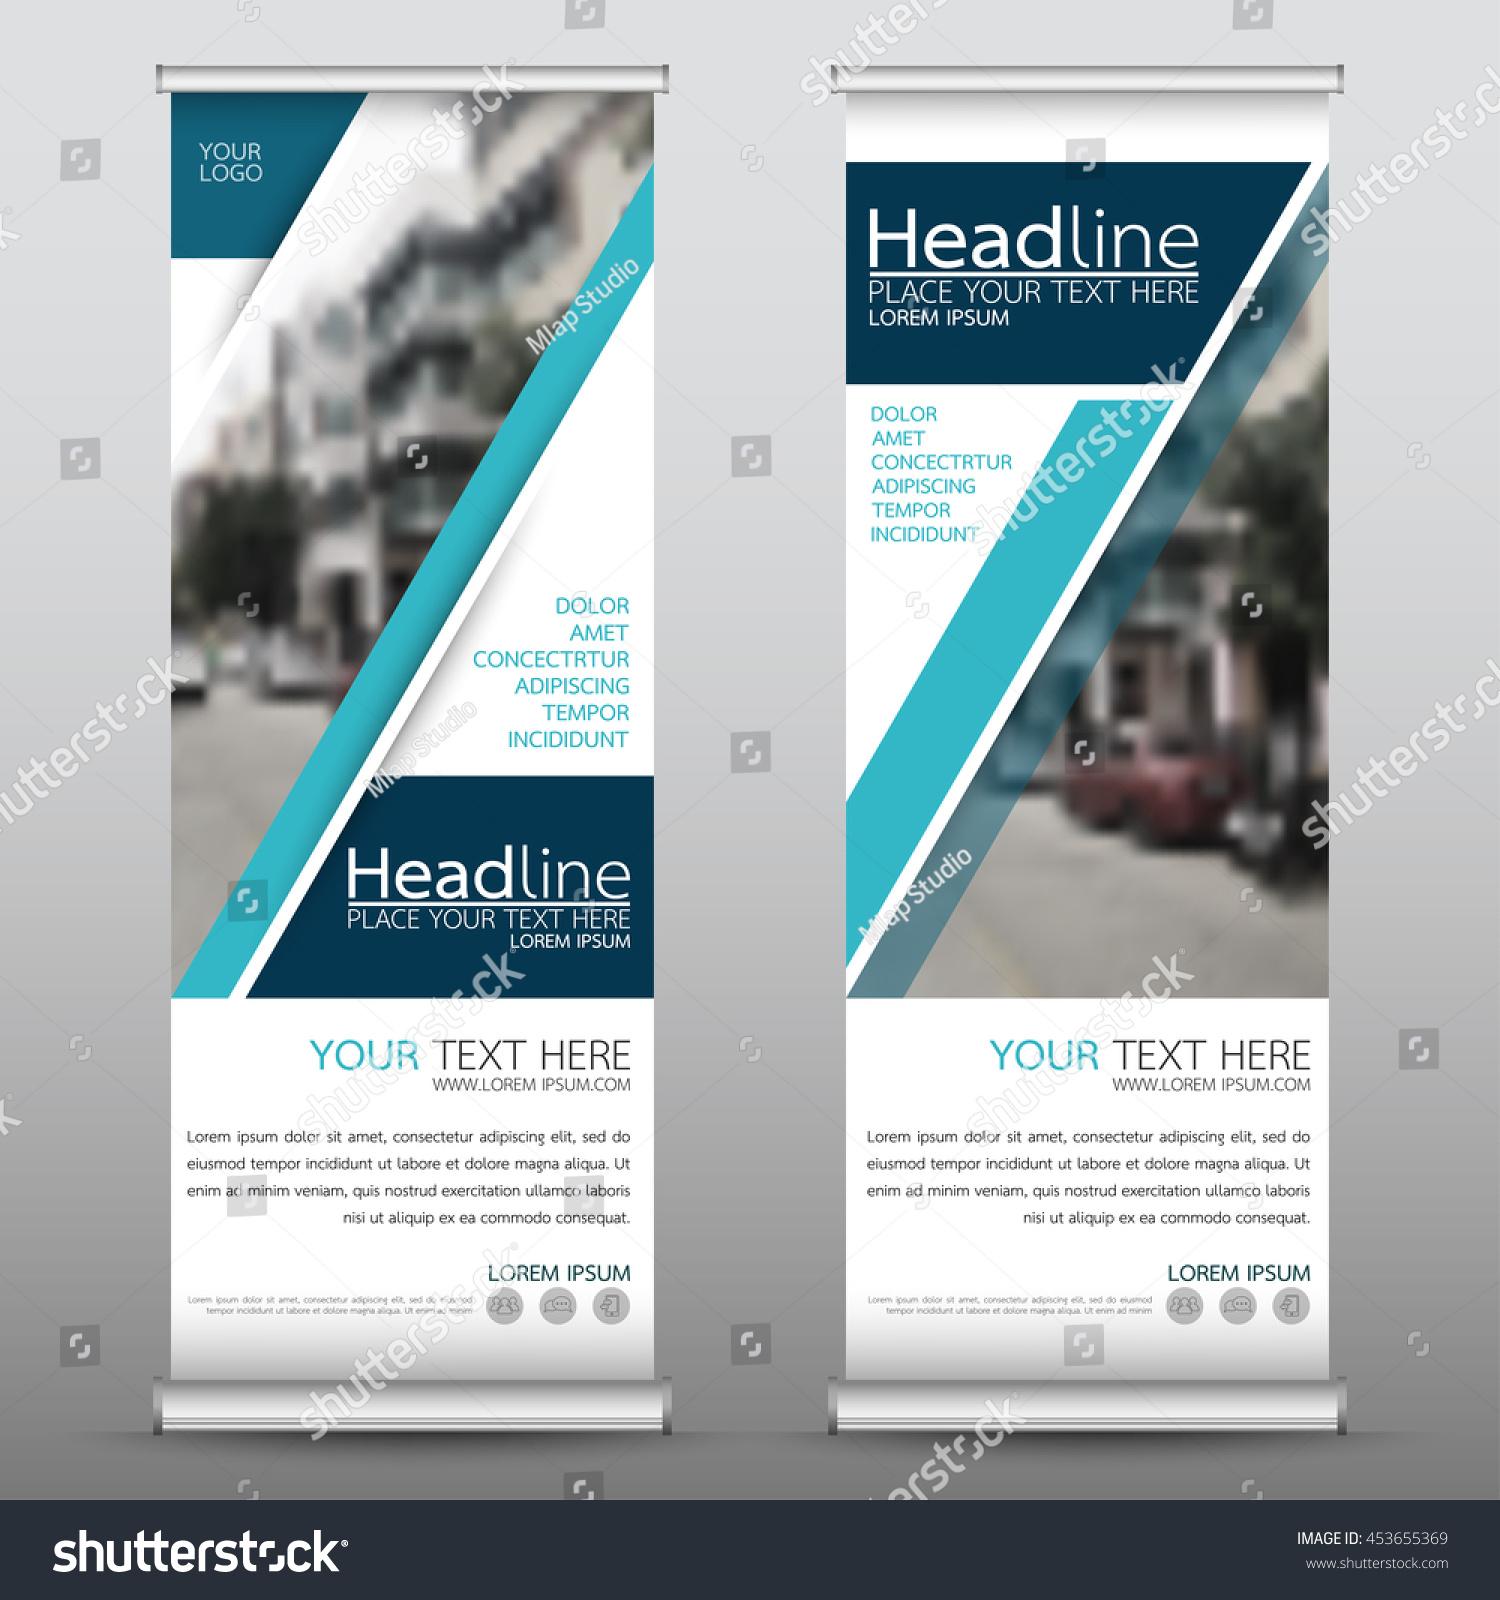 blue technology roll business banner design stock vector 453655369 shutterstock. Black Bedroom Furniture Sets. Home Design Ideas